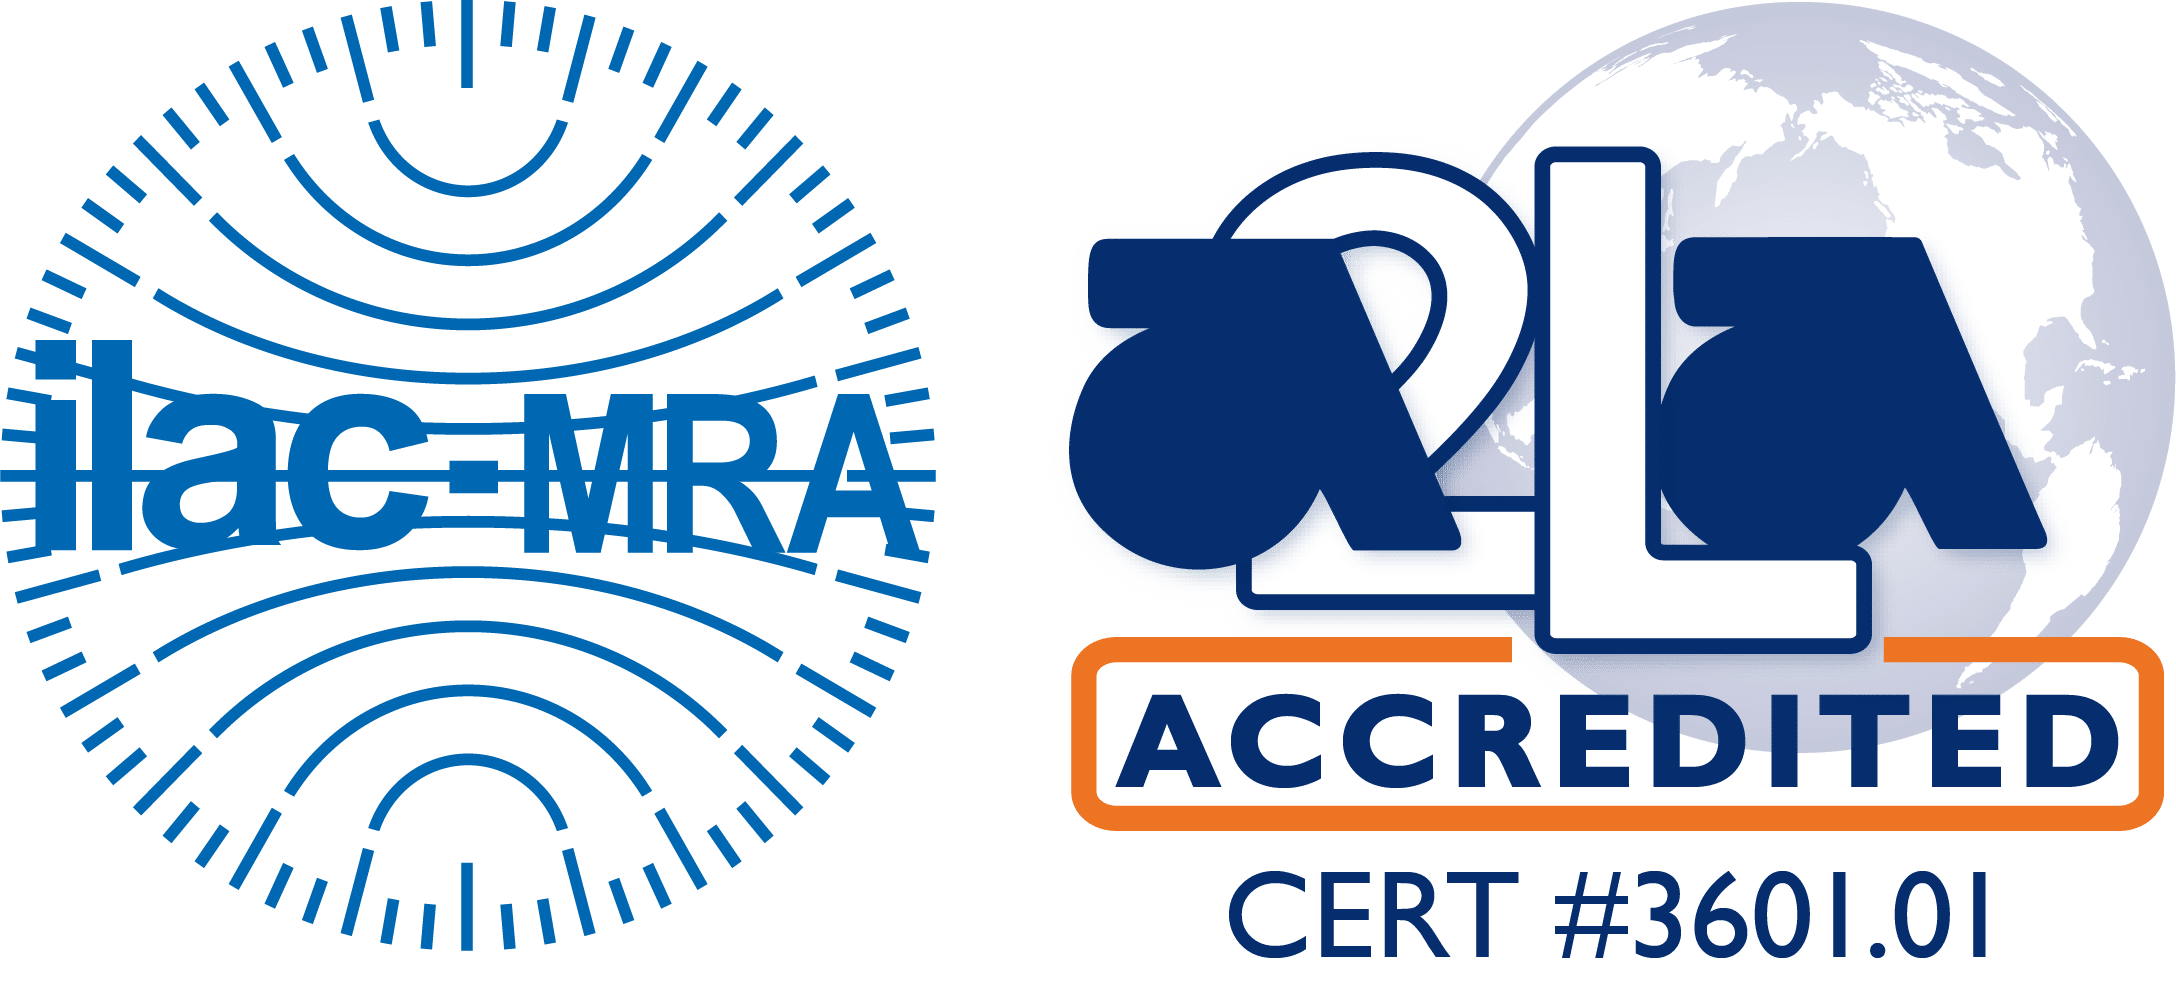 ILAC MRA-A2LA Accredited Symbol 3601-01 (HARAHAN)